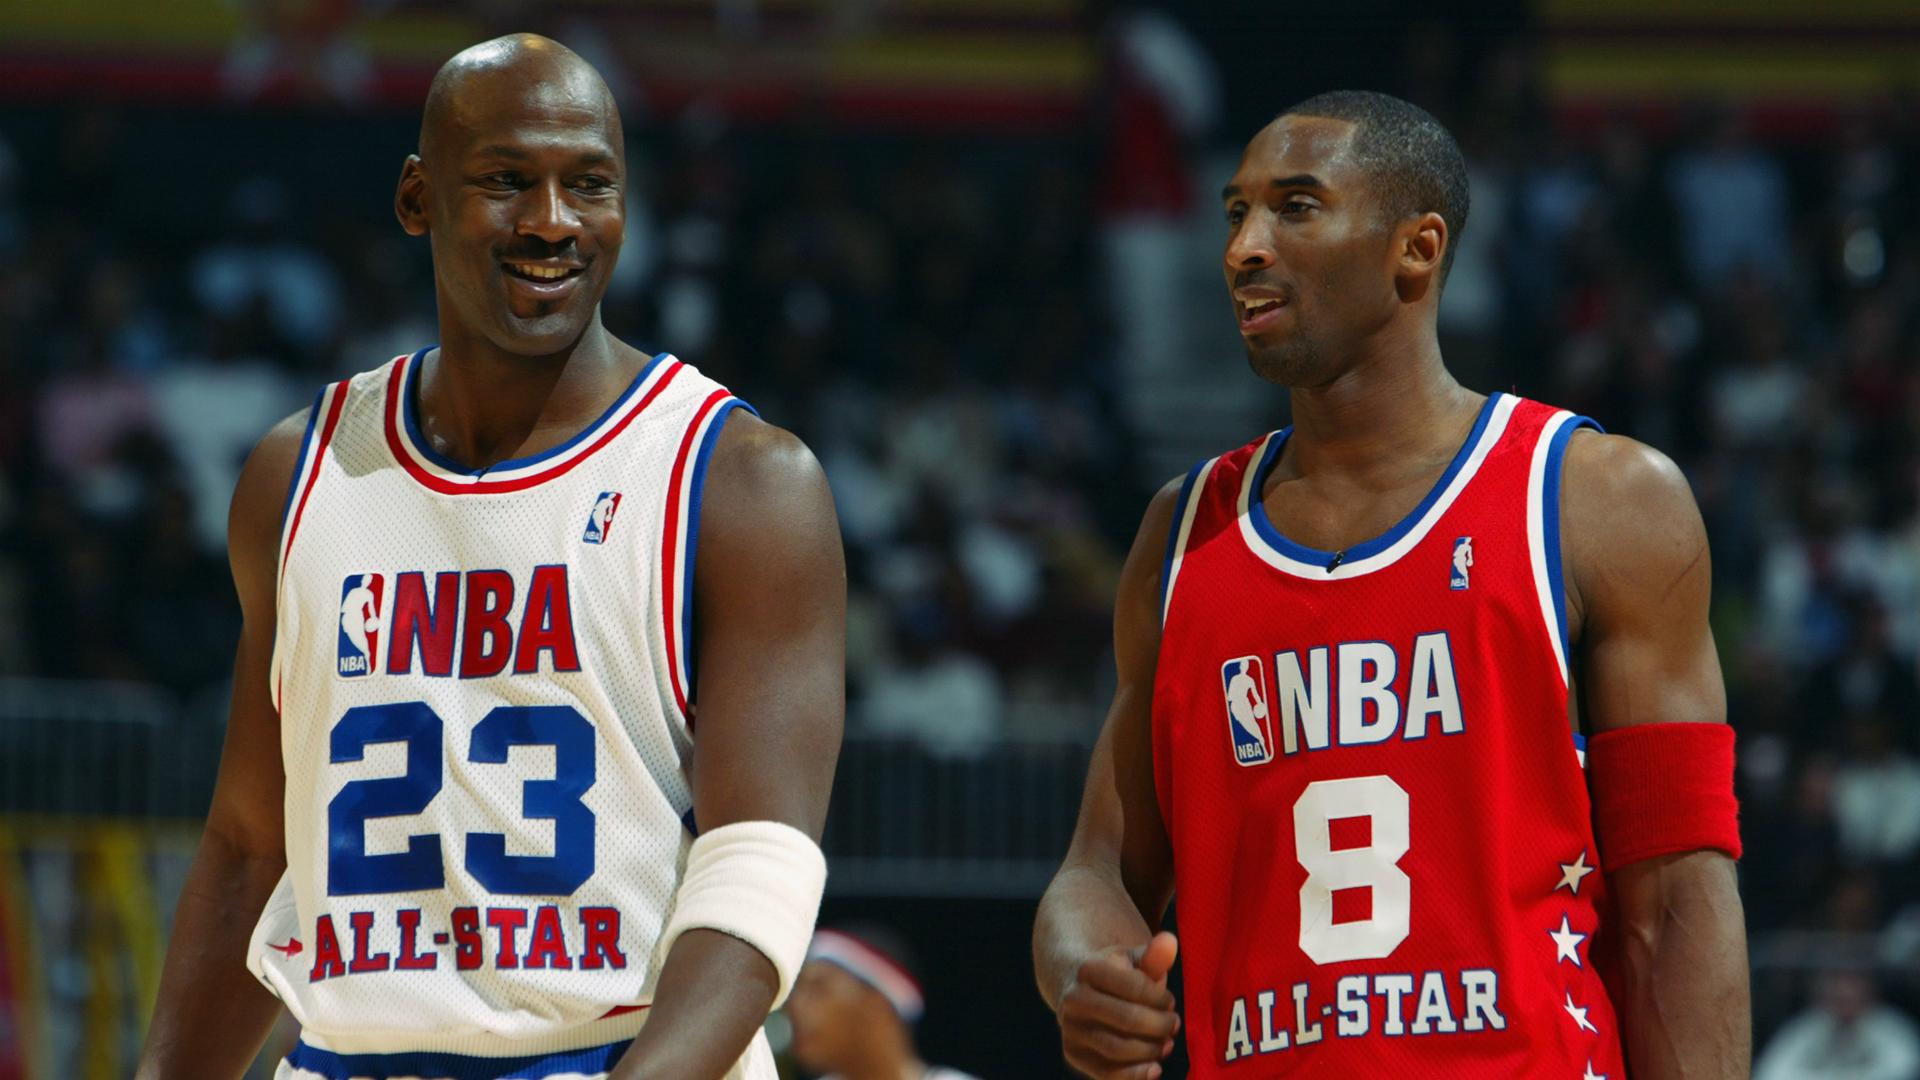 Michael-Jordan-Kobe-Bryant-Getty-FTR-120715